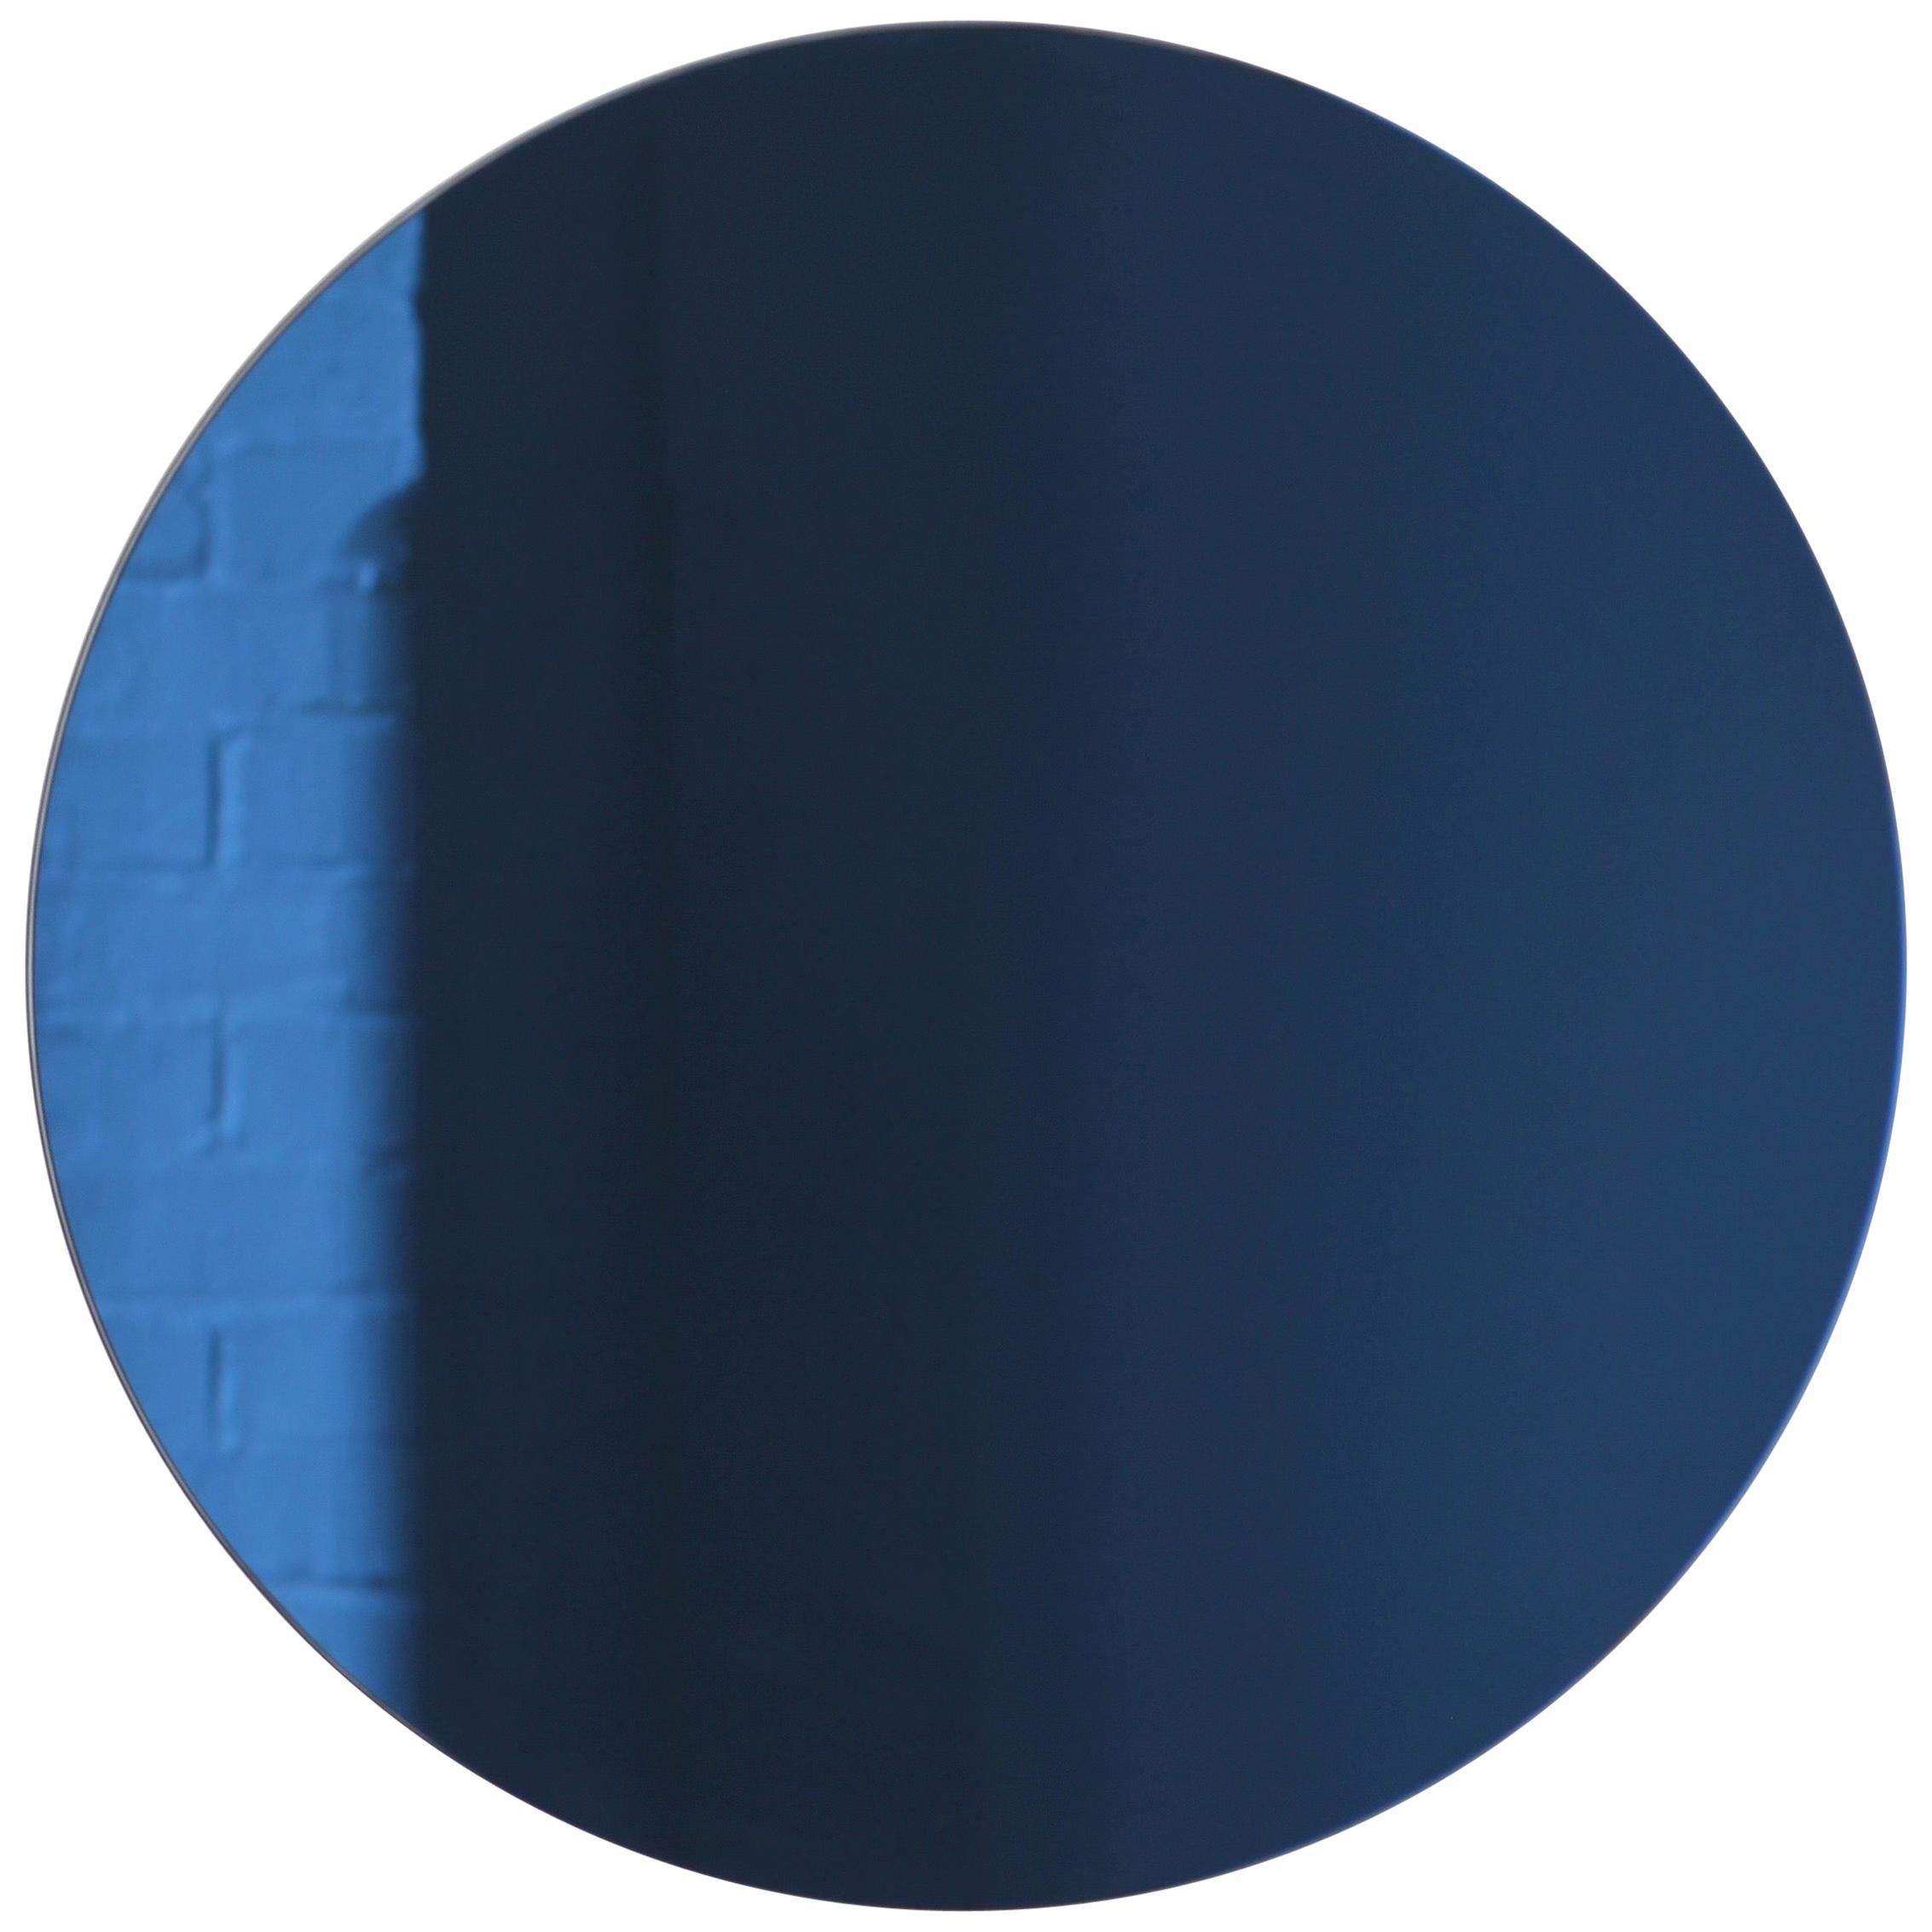 Orbis™ Blue Tinted Round Contemporary Frameless Mirror - Medium